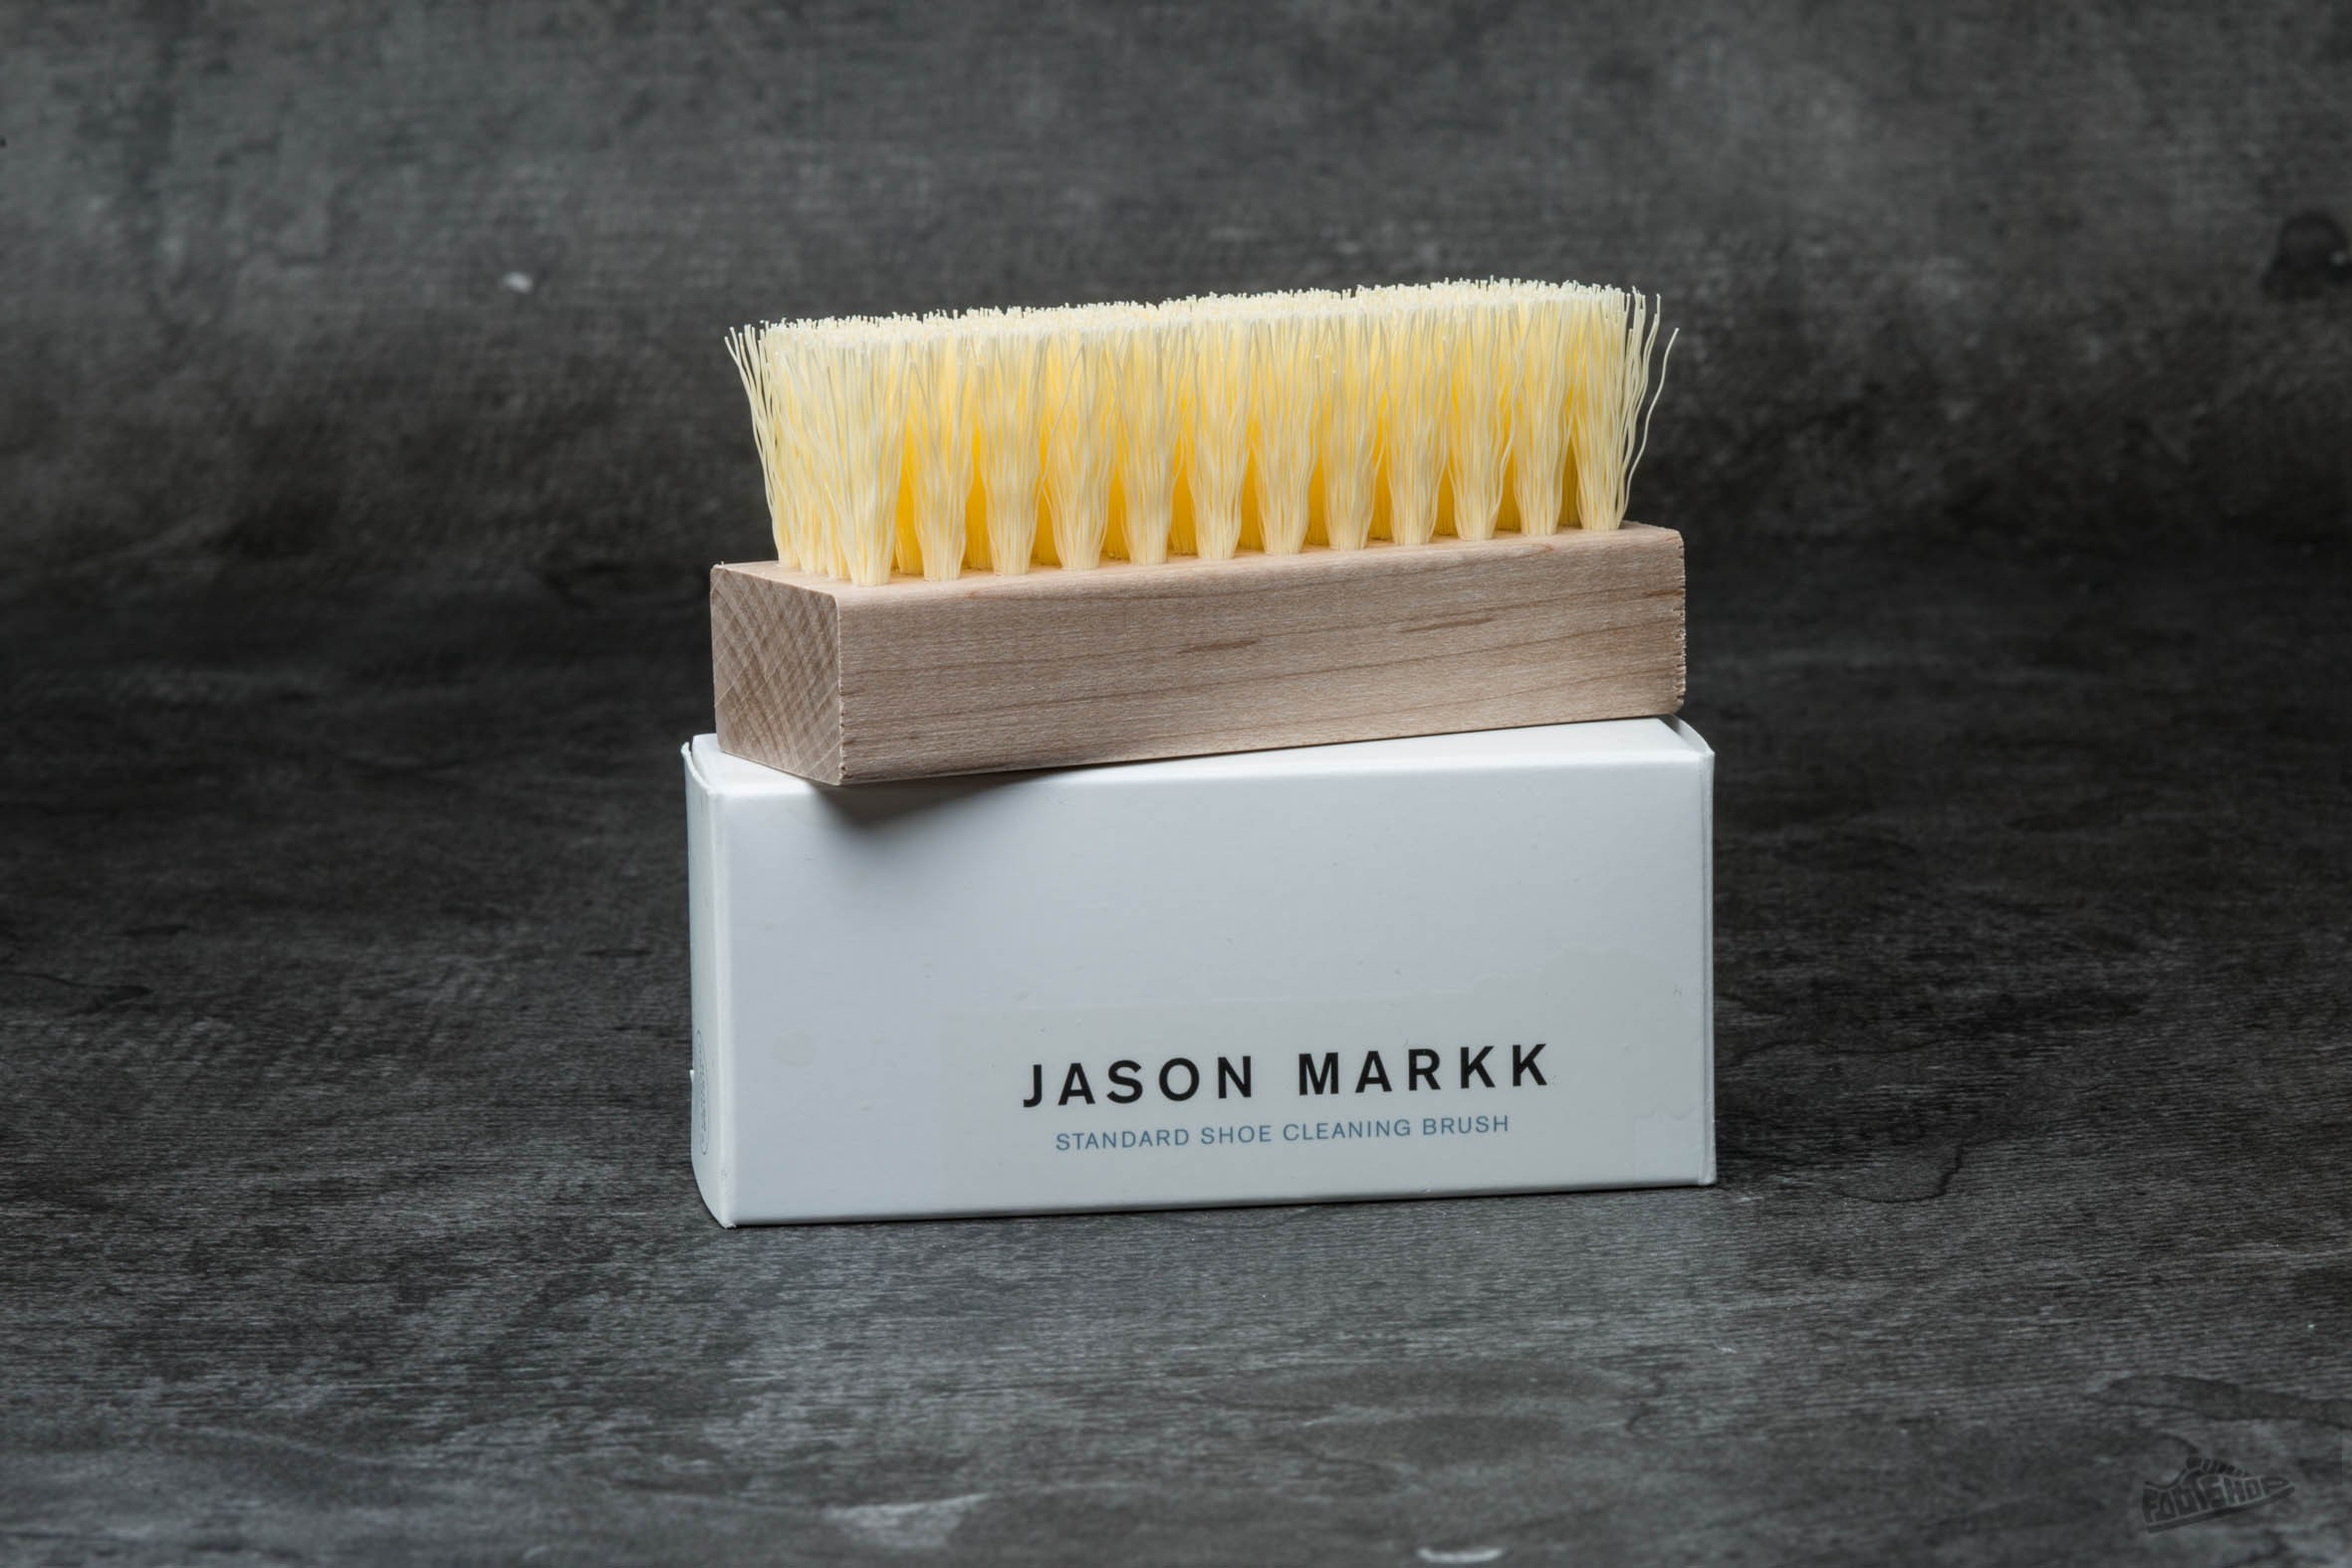 Jason Markk Standard Shoe Cleaning Brush za skvelú cenu 10 € kúpite na Footshop.sk